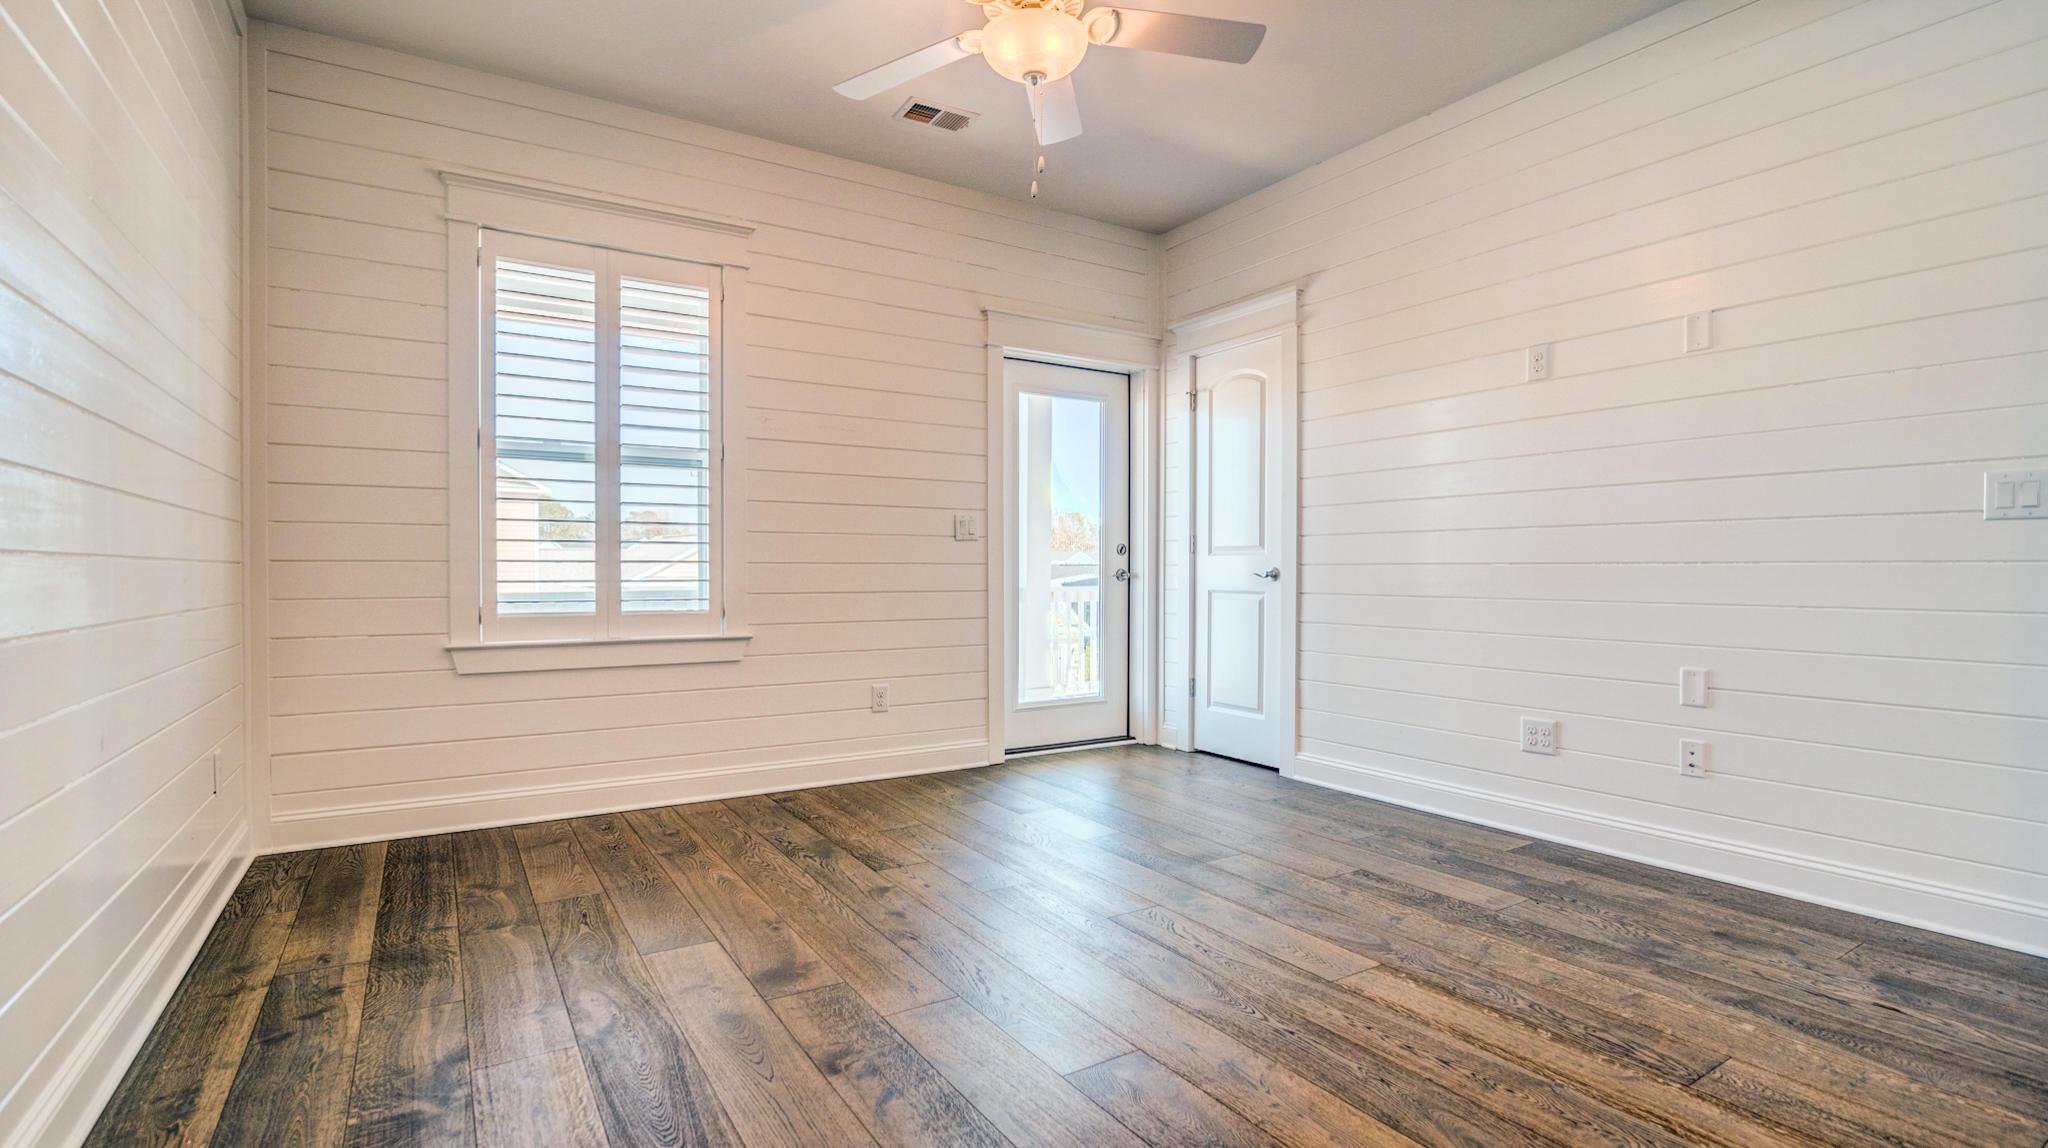 Carolina Park Homes For Sale - 3687 Spindrift, Mount Pleasant, SC - 32